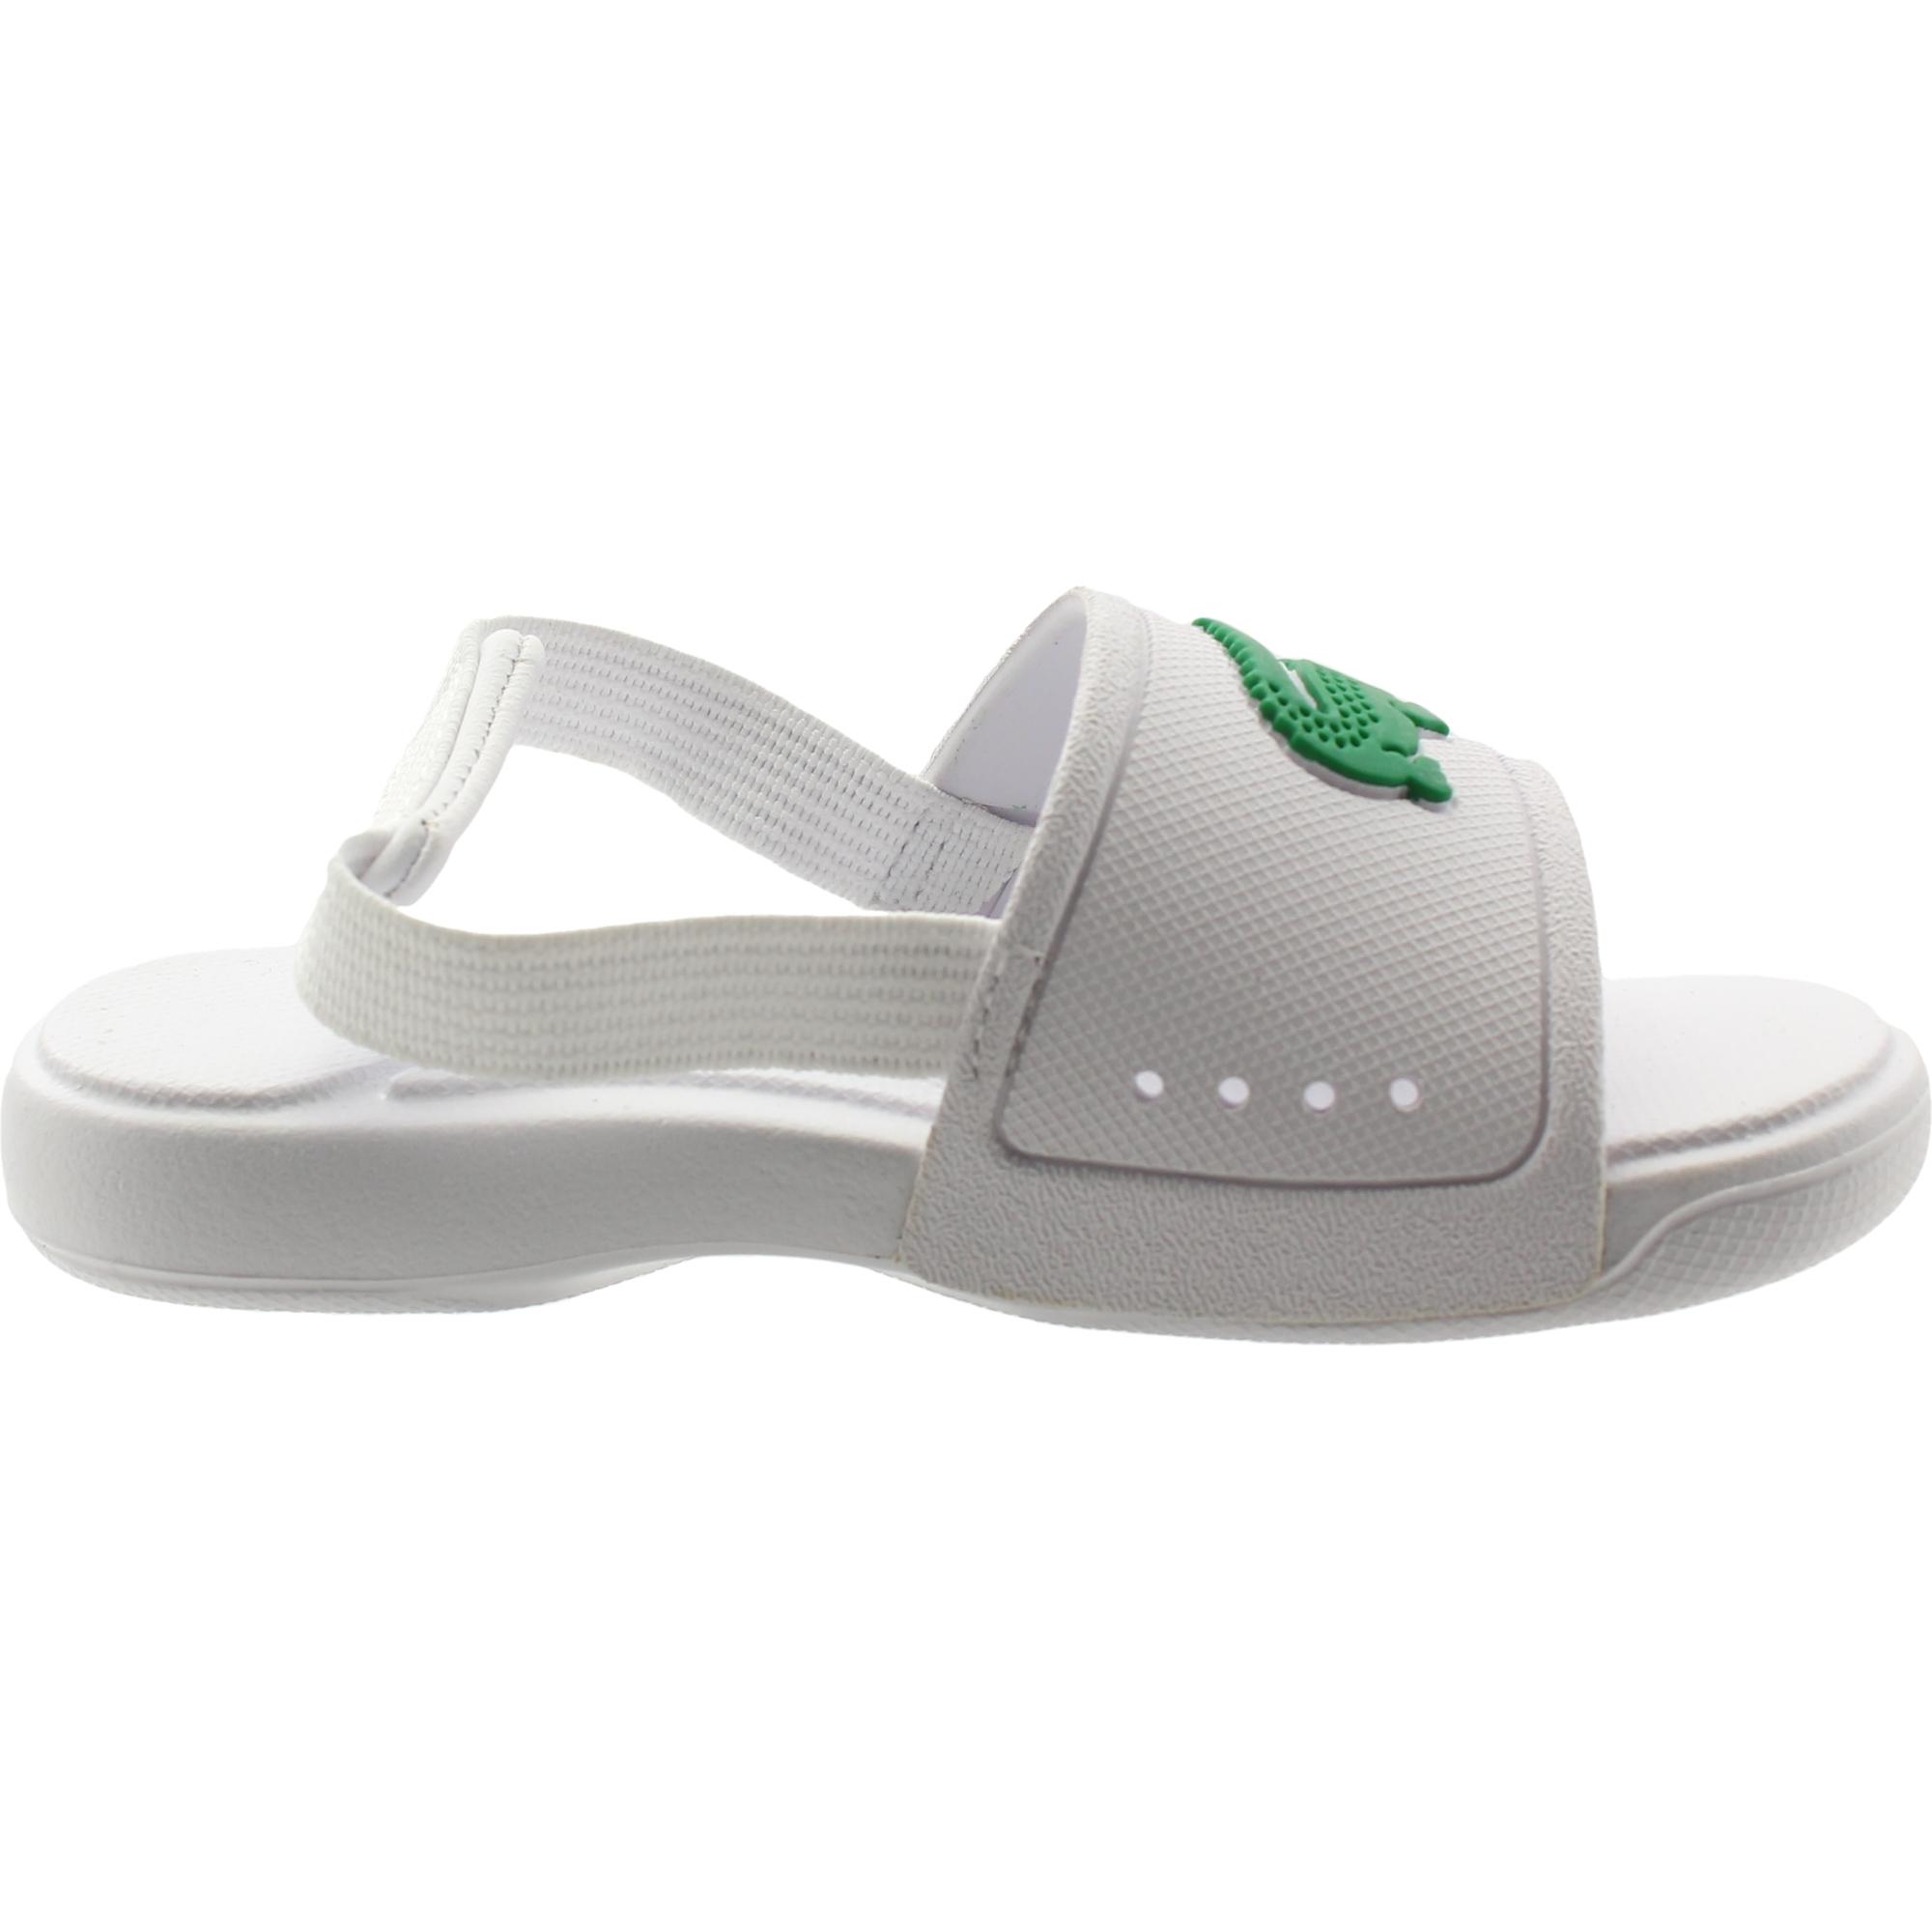 Lacoste L.30 Slide 119 2 White//Green Rubber Baby Slides Sandals